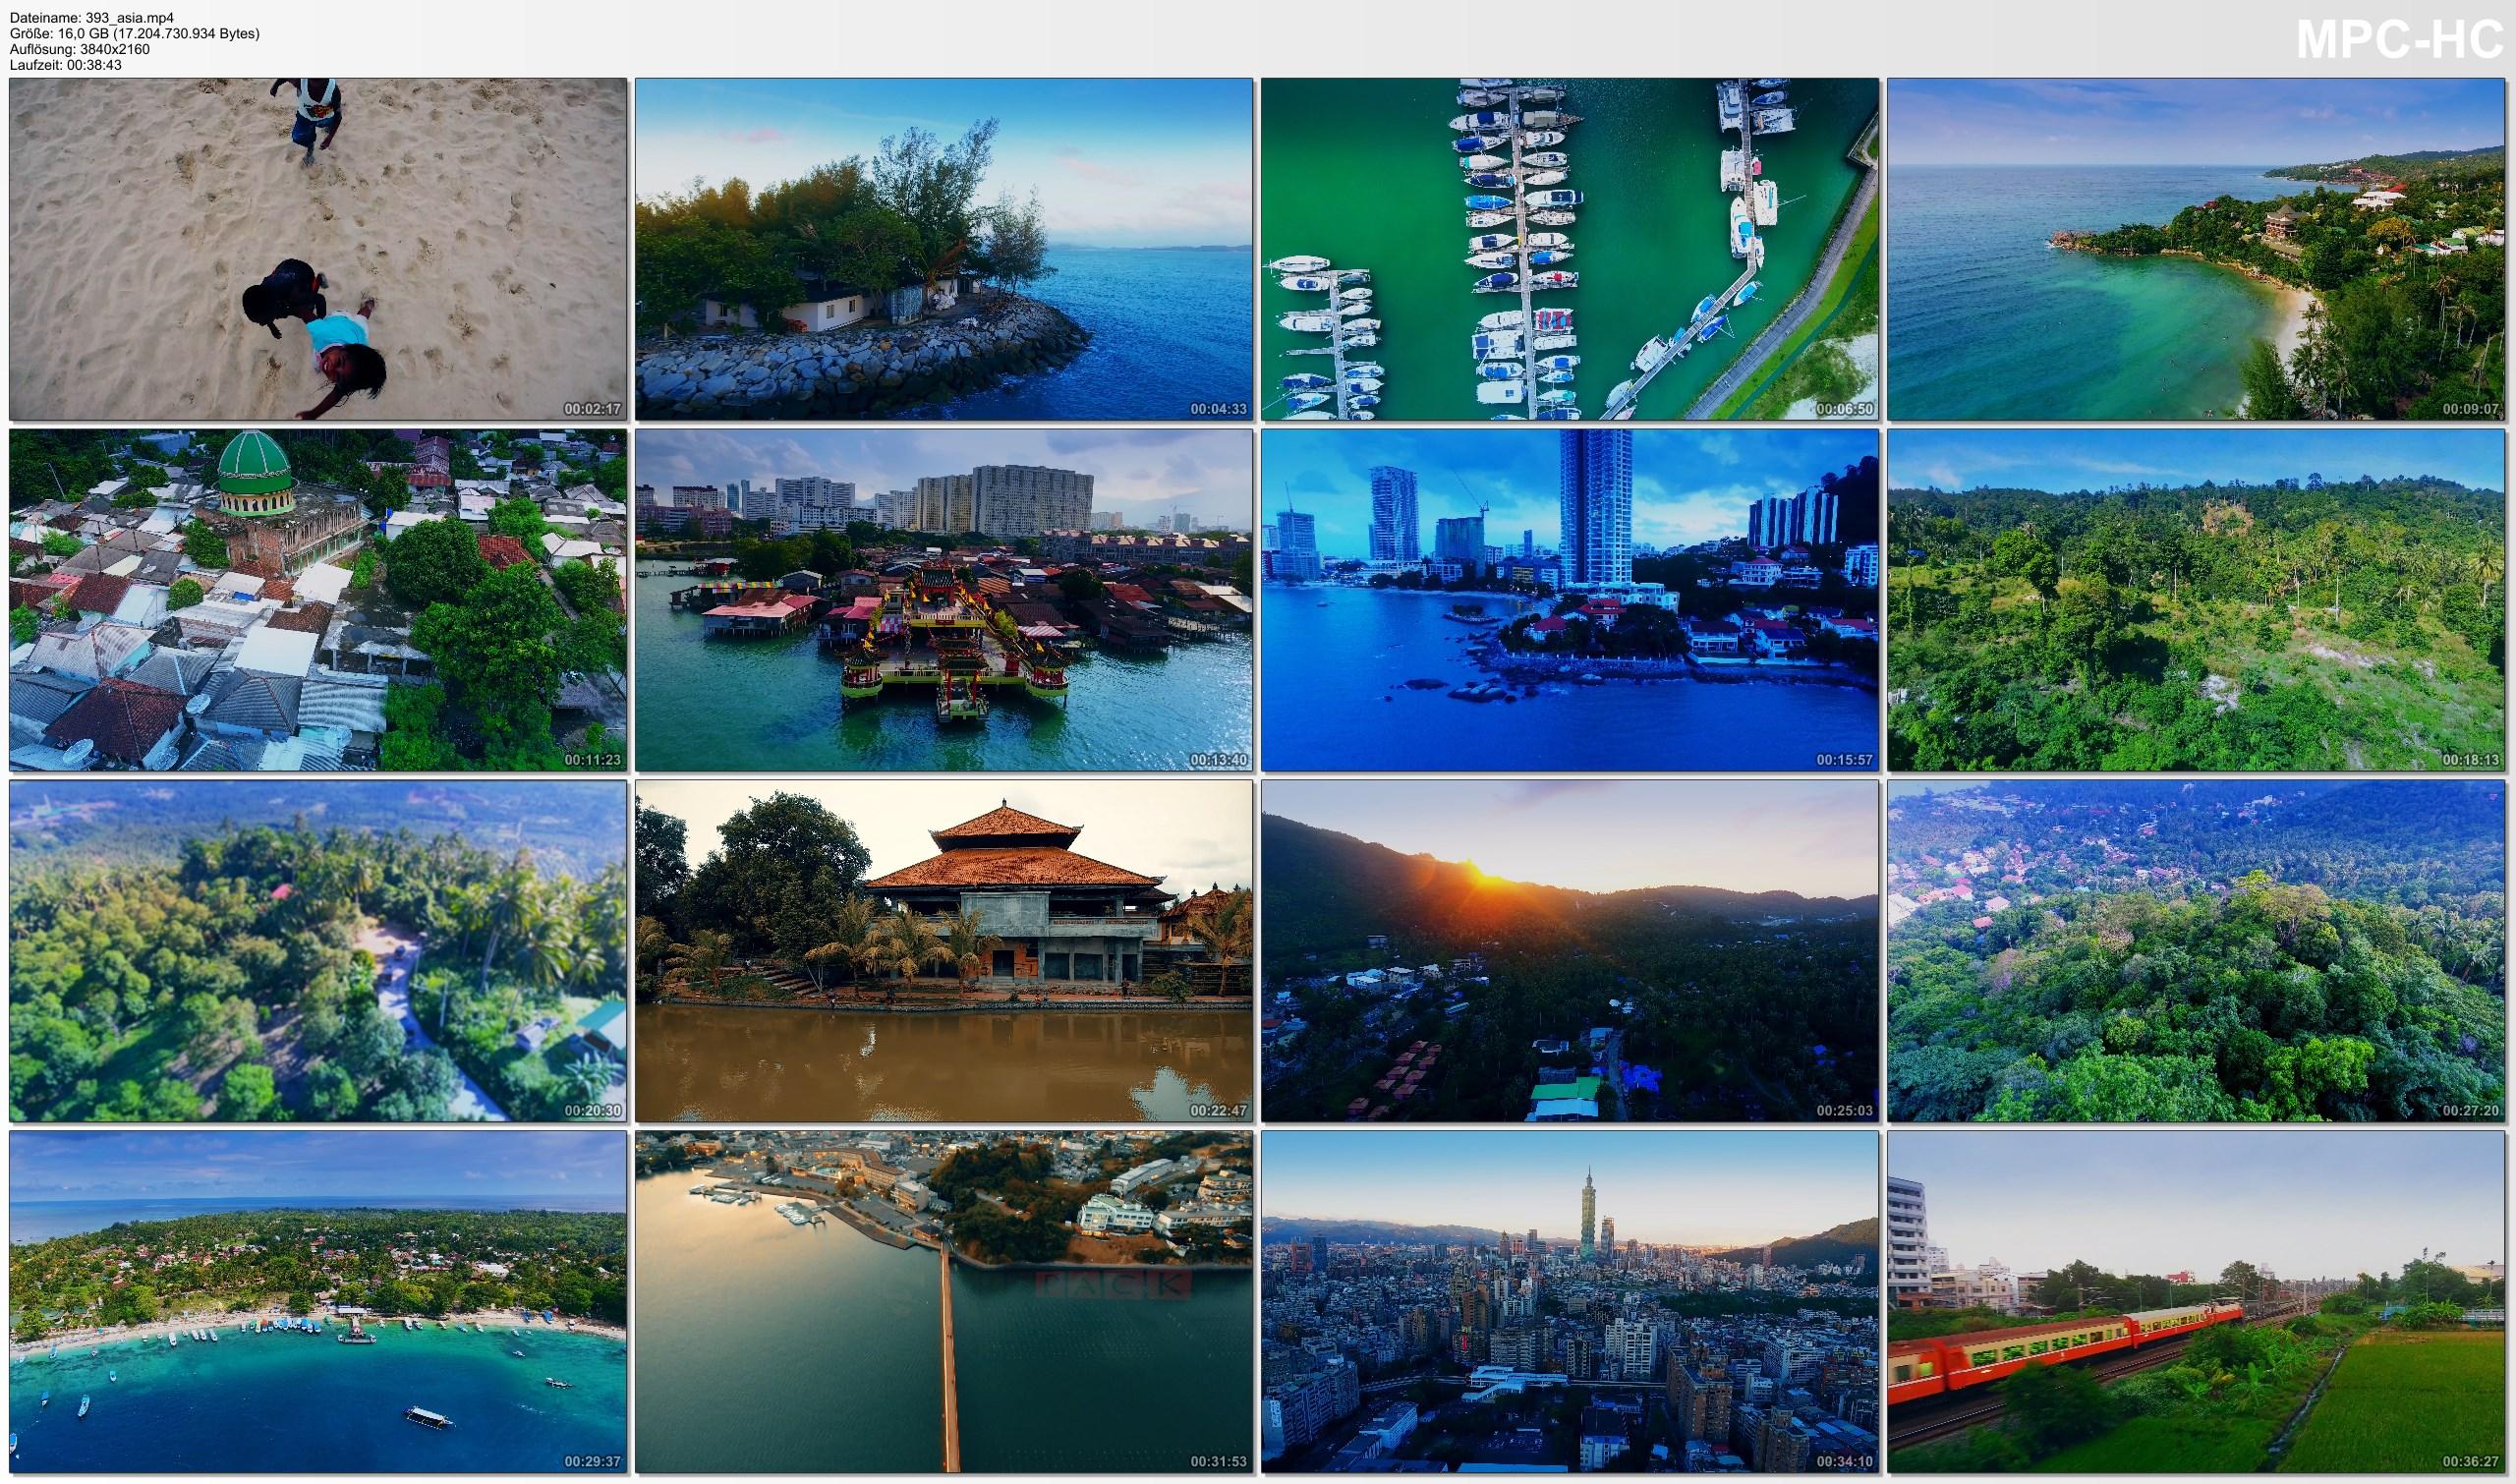 Drone Pictures from Video 【4K】Drone Footage | ASIAs ISLANDS 2019 | Boracay Langkawi Ko Phangan Lombok Penang Bali Gili Taiwan